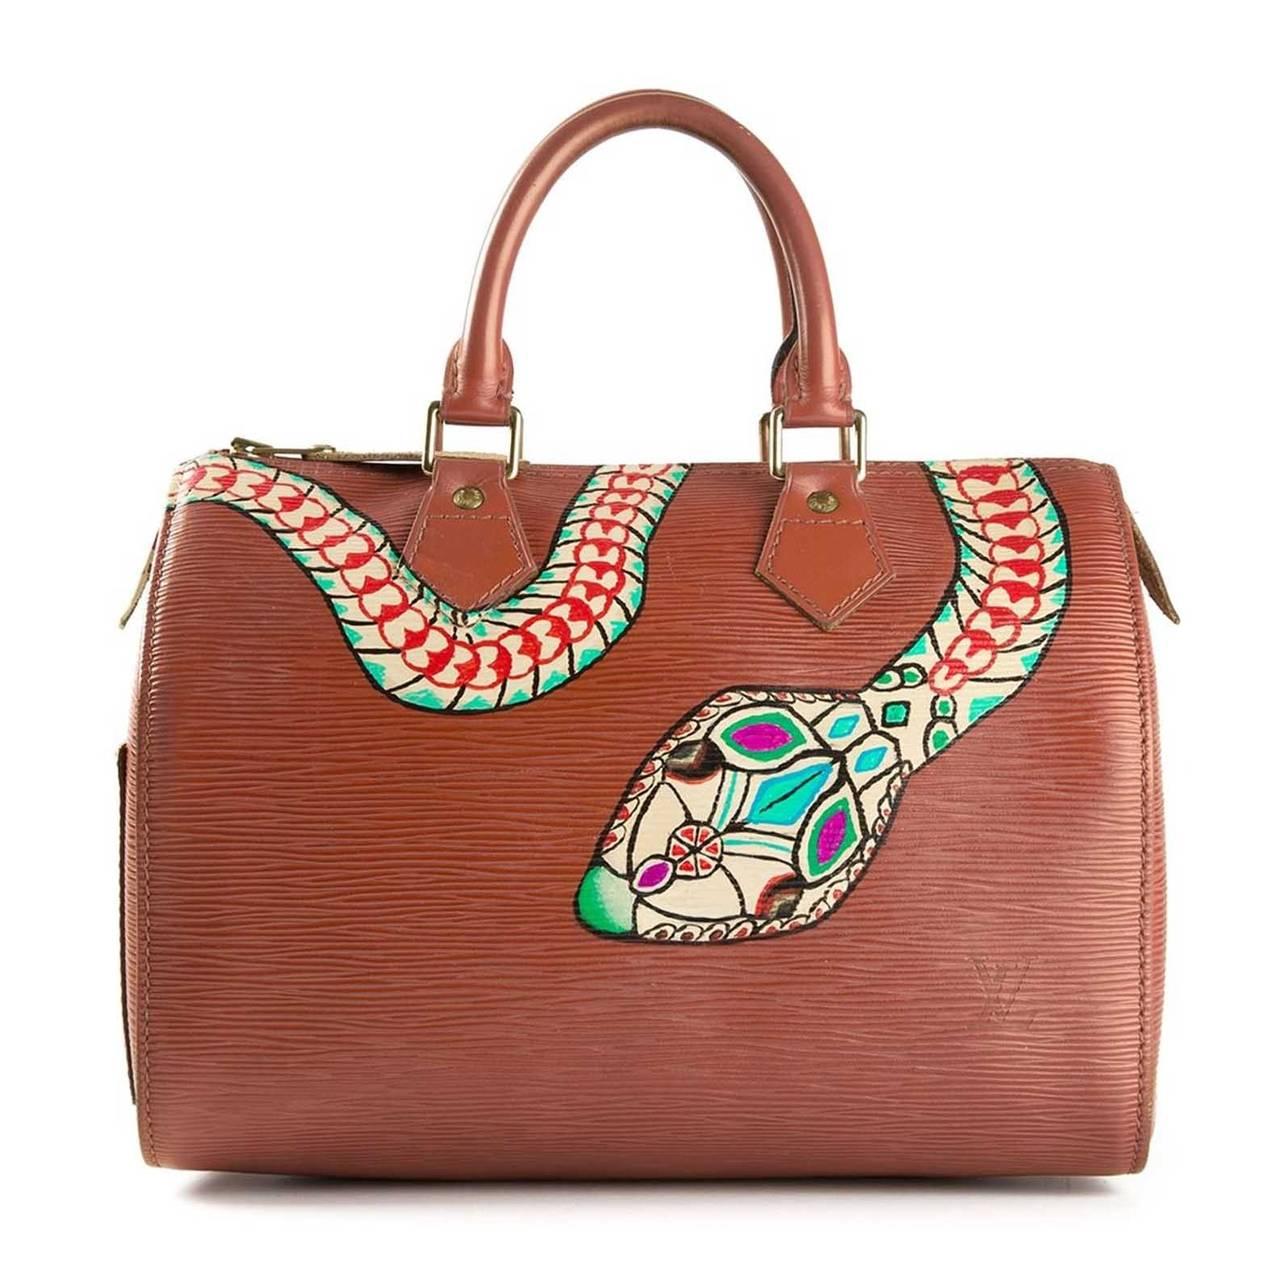 Louis Vuitton Hand Painted Epi Speedy Bag At 1stdibs